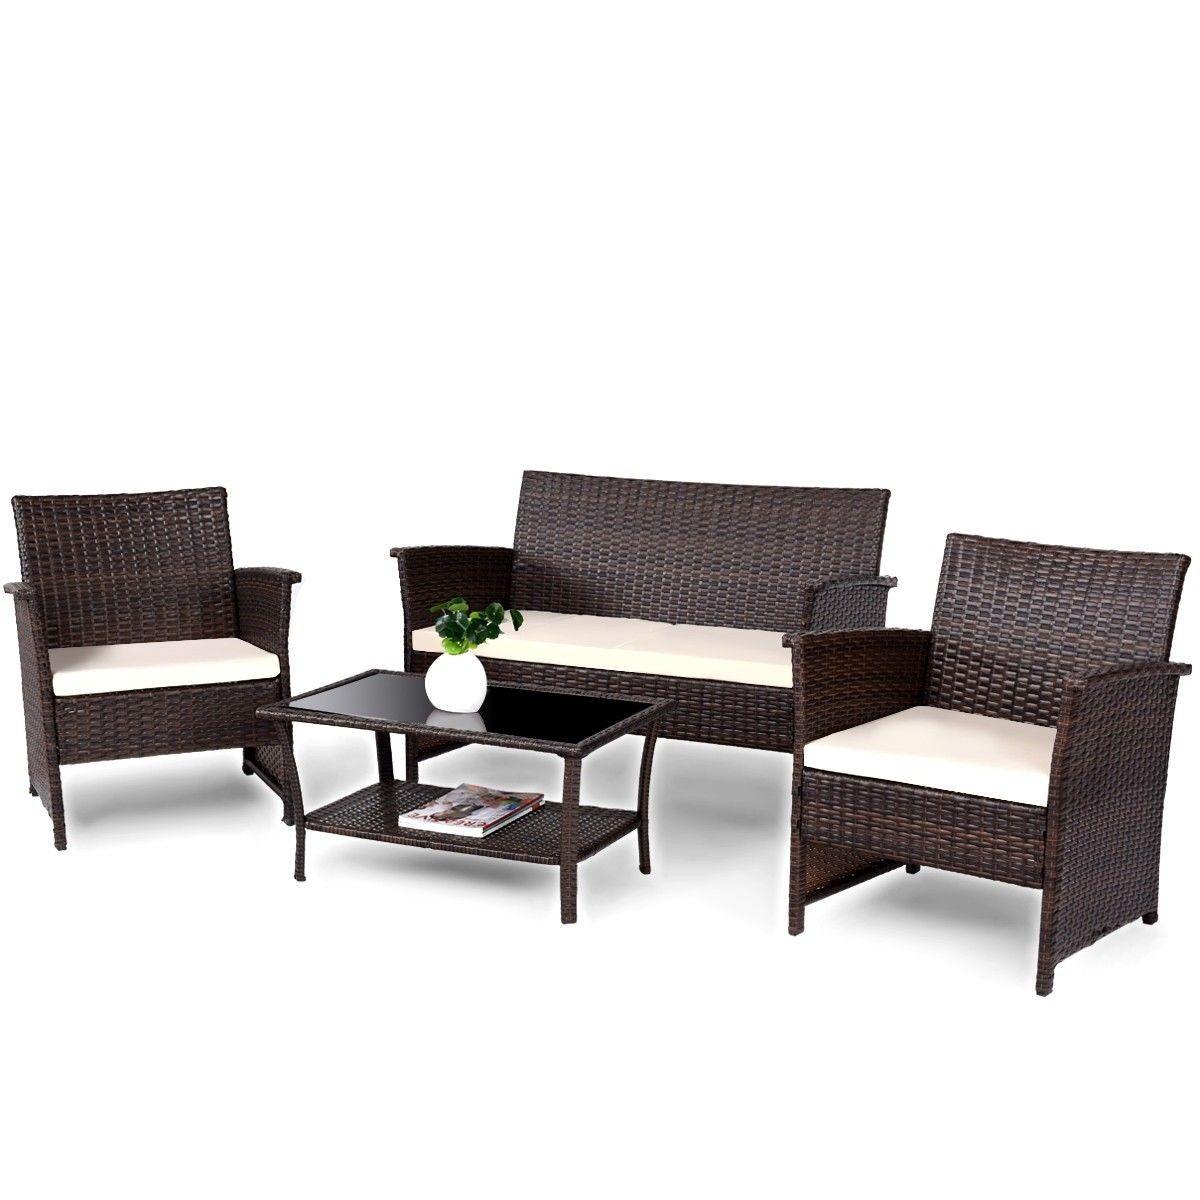 4 pcs Outdoor Patio Rattan Furniture Wicker Sofa Set ...